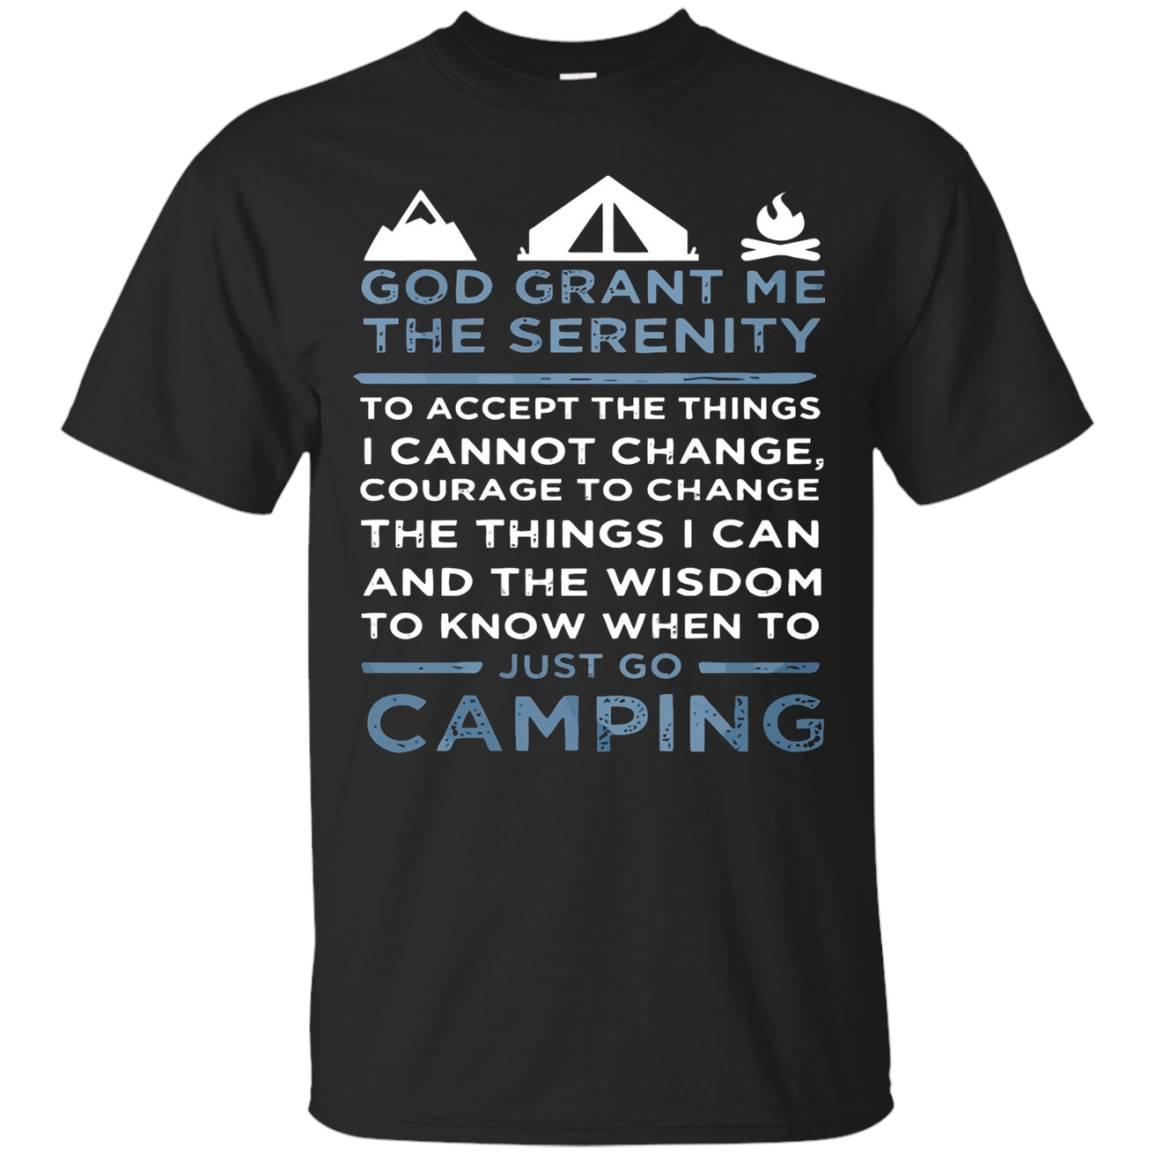 Camp Shirt God Grant Me The Serenity Shirt